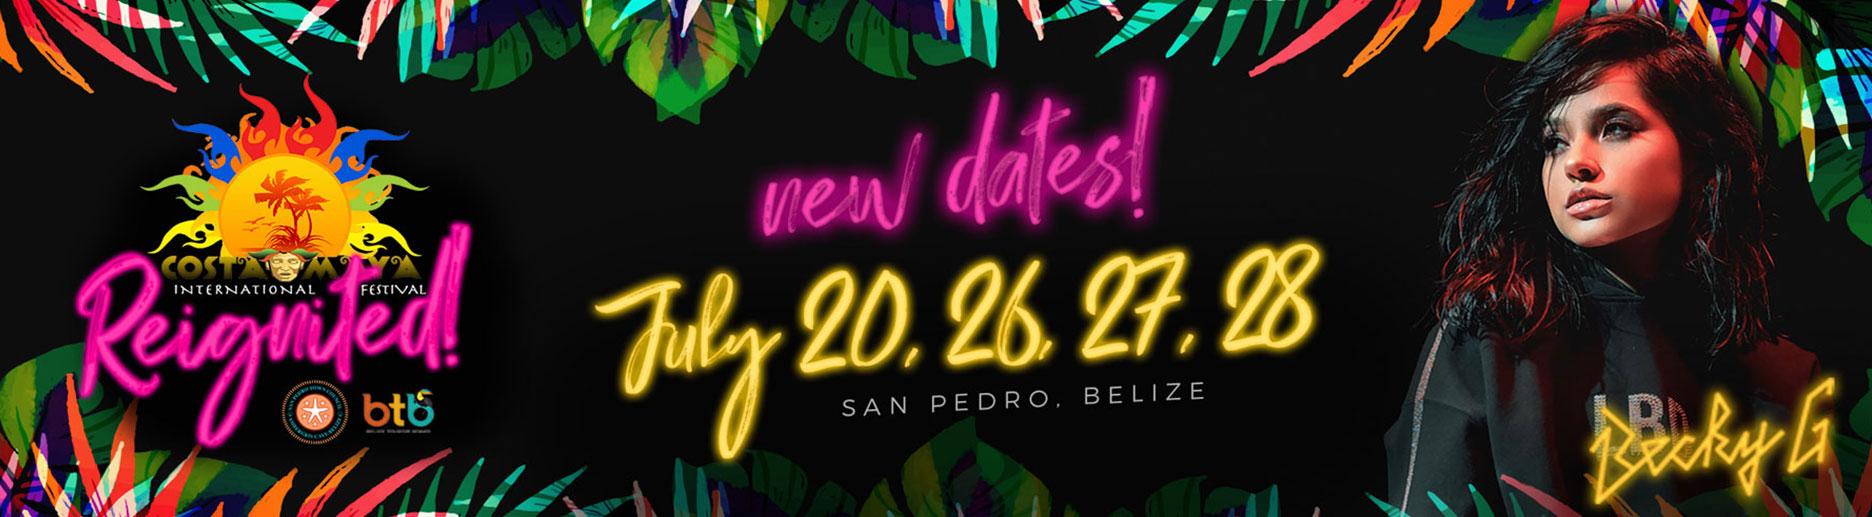 Becky G Live in San Pedro Belize - International Costa Maya